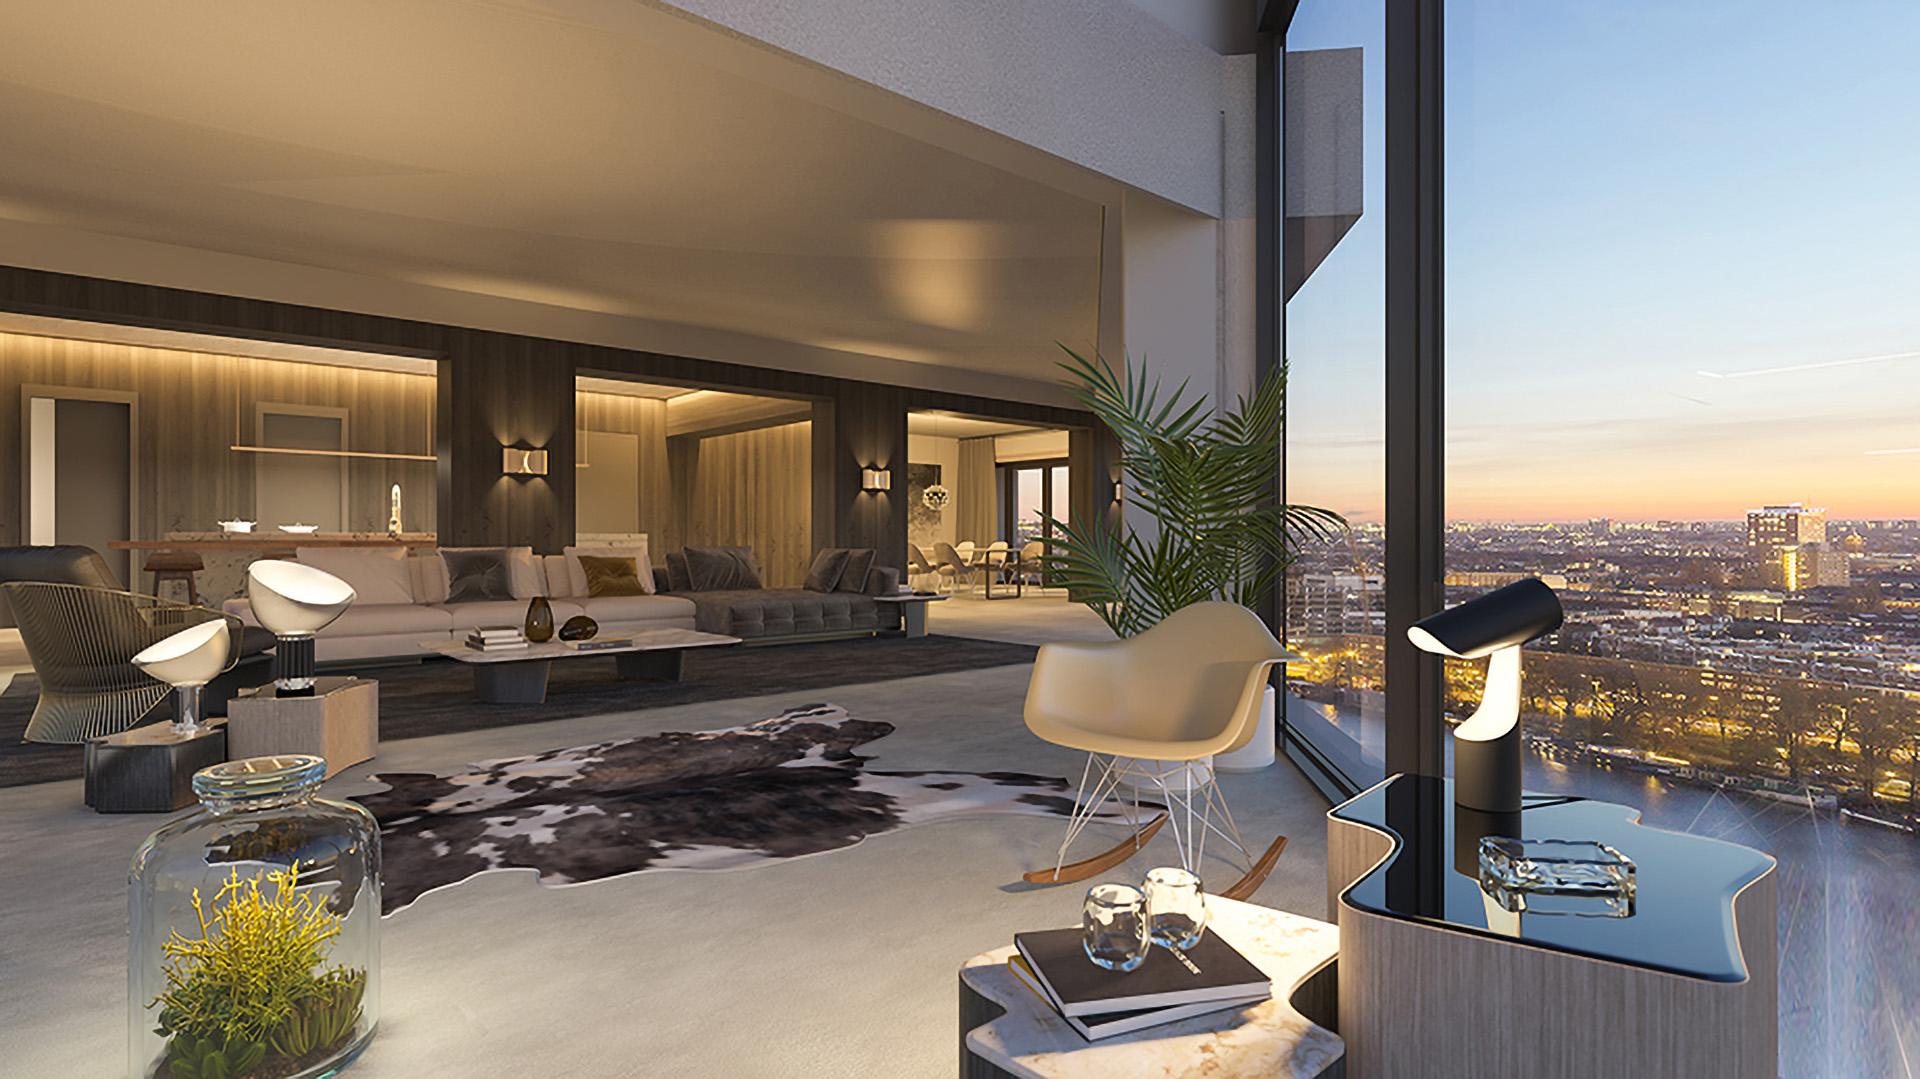 Apartments haut